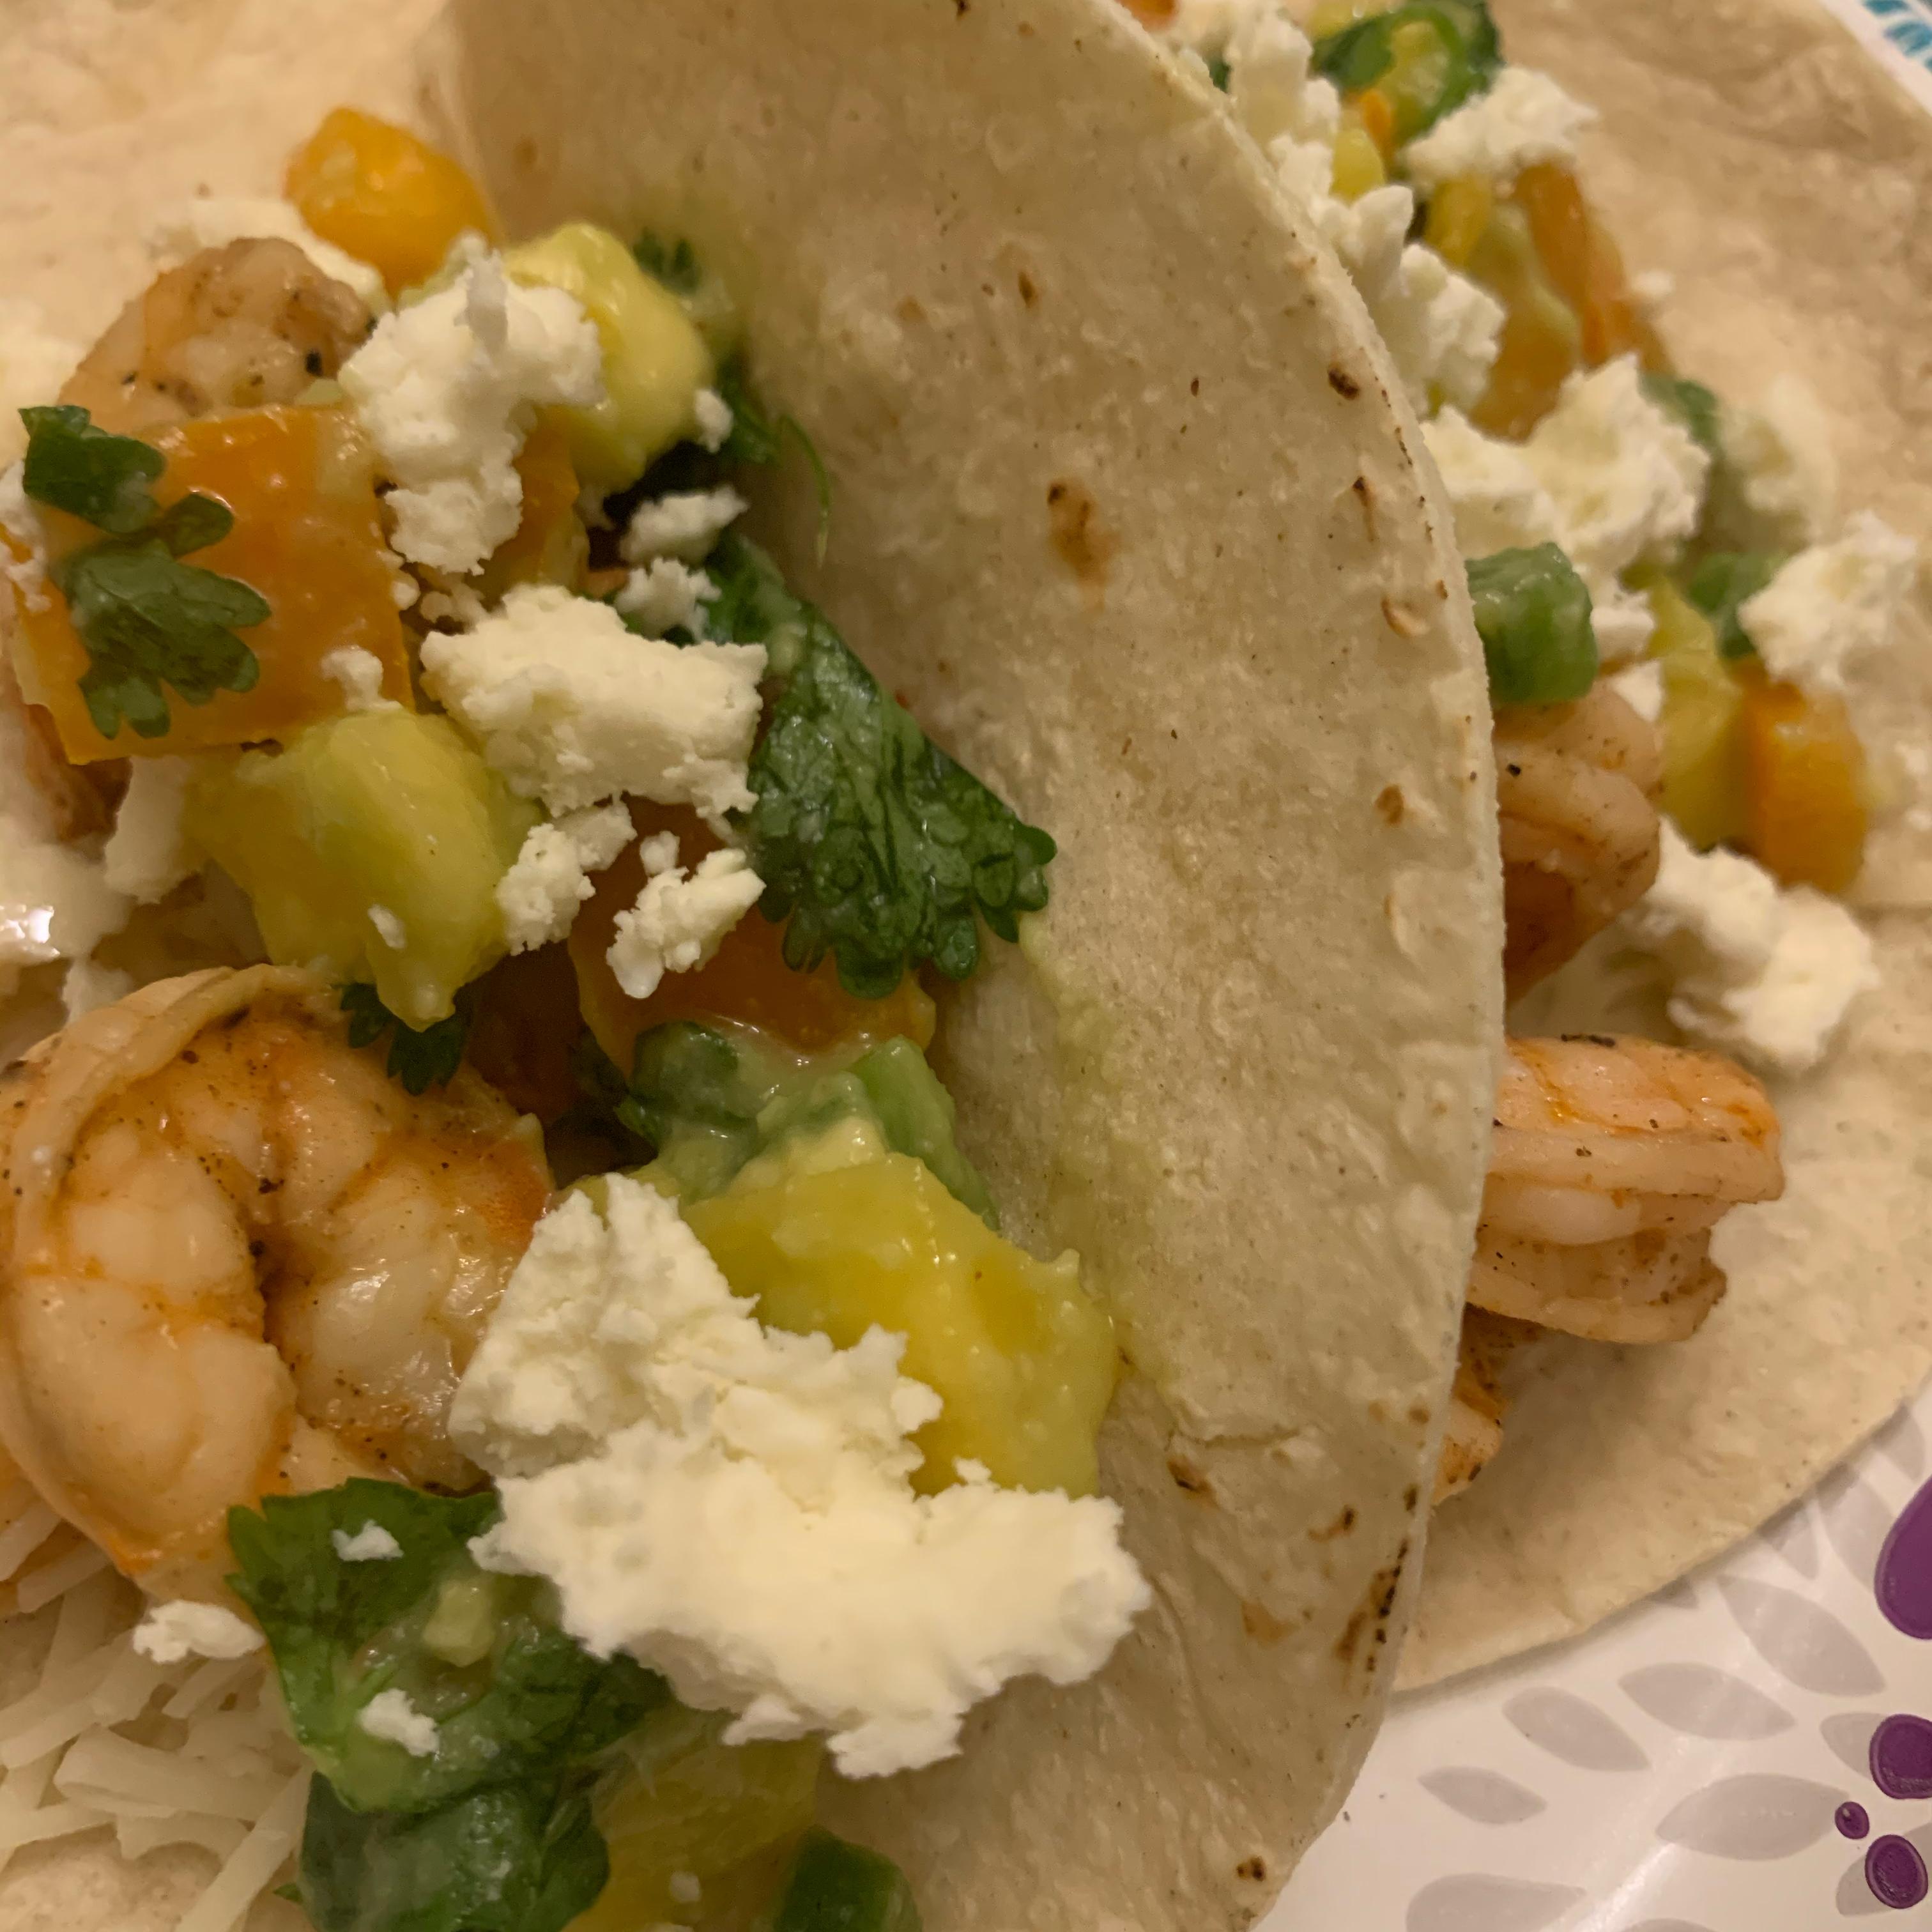 Lime Shrimp Tacos with Mango Salsa Halla Farhat